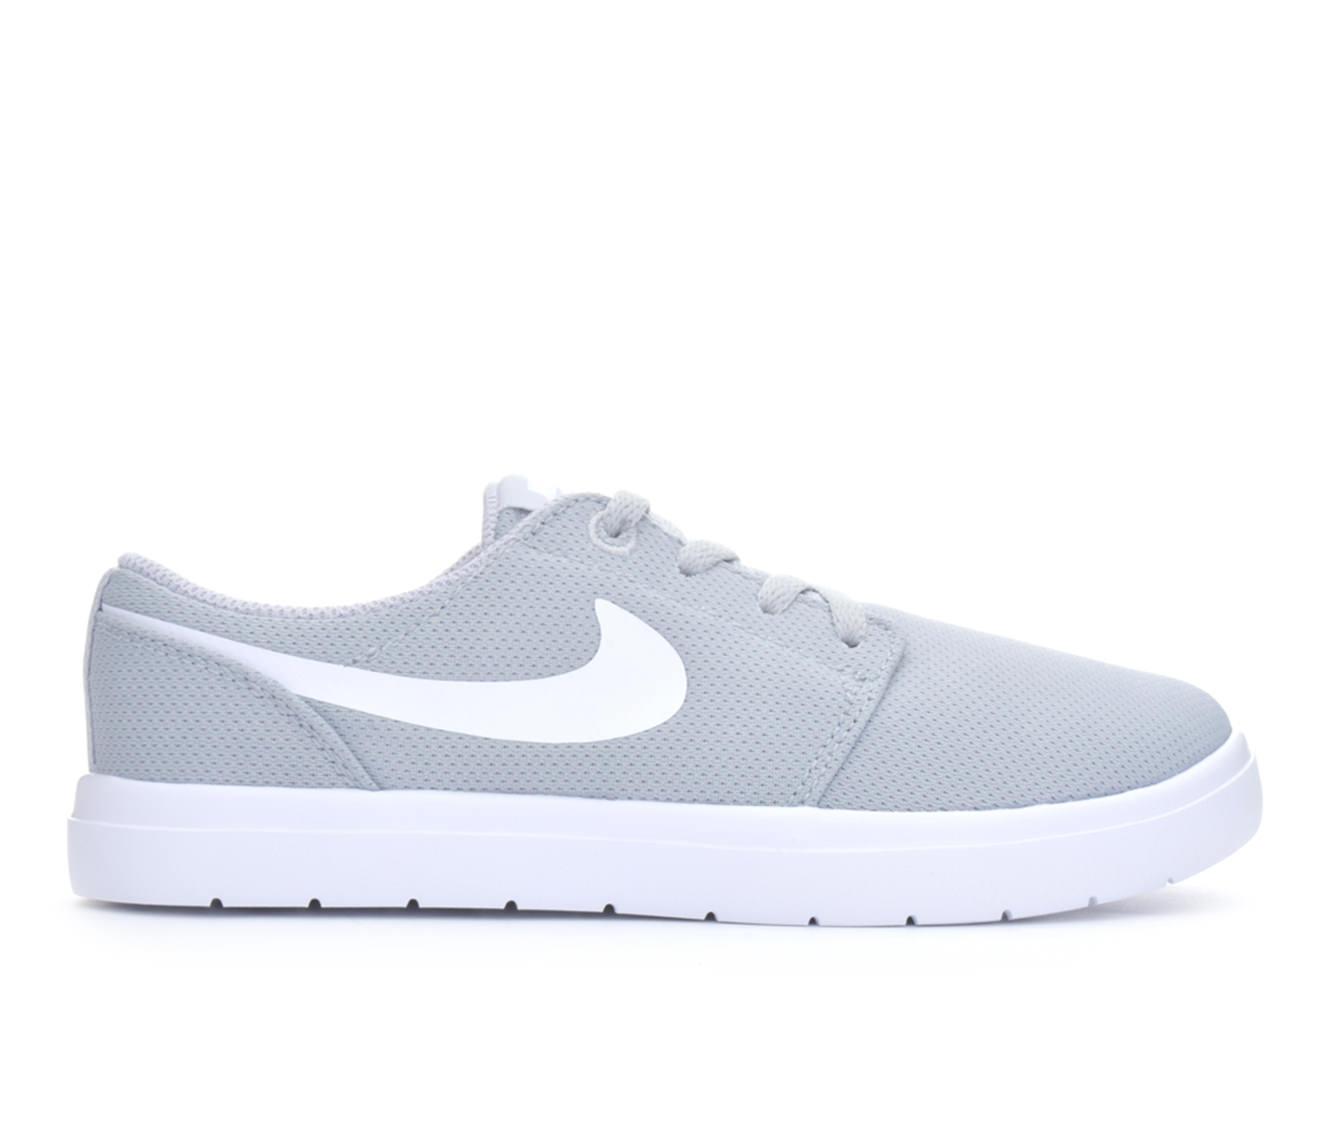 Boys' Nike Portmore II Ultralight Skate Shoes (Grey)